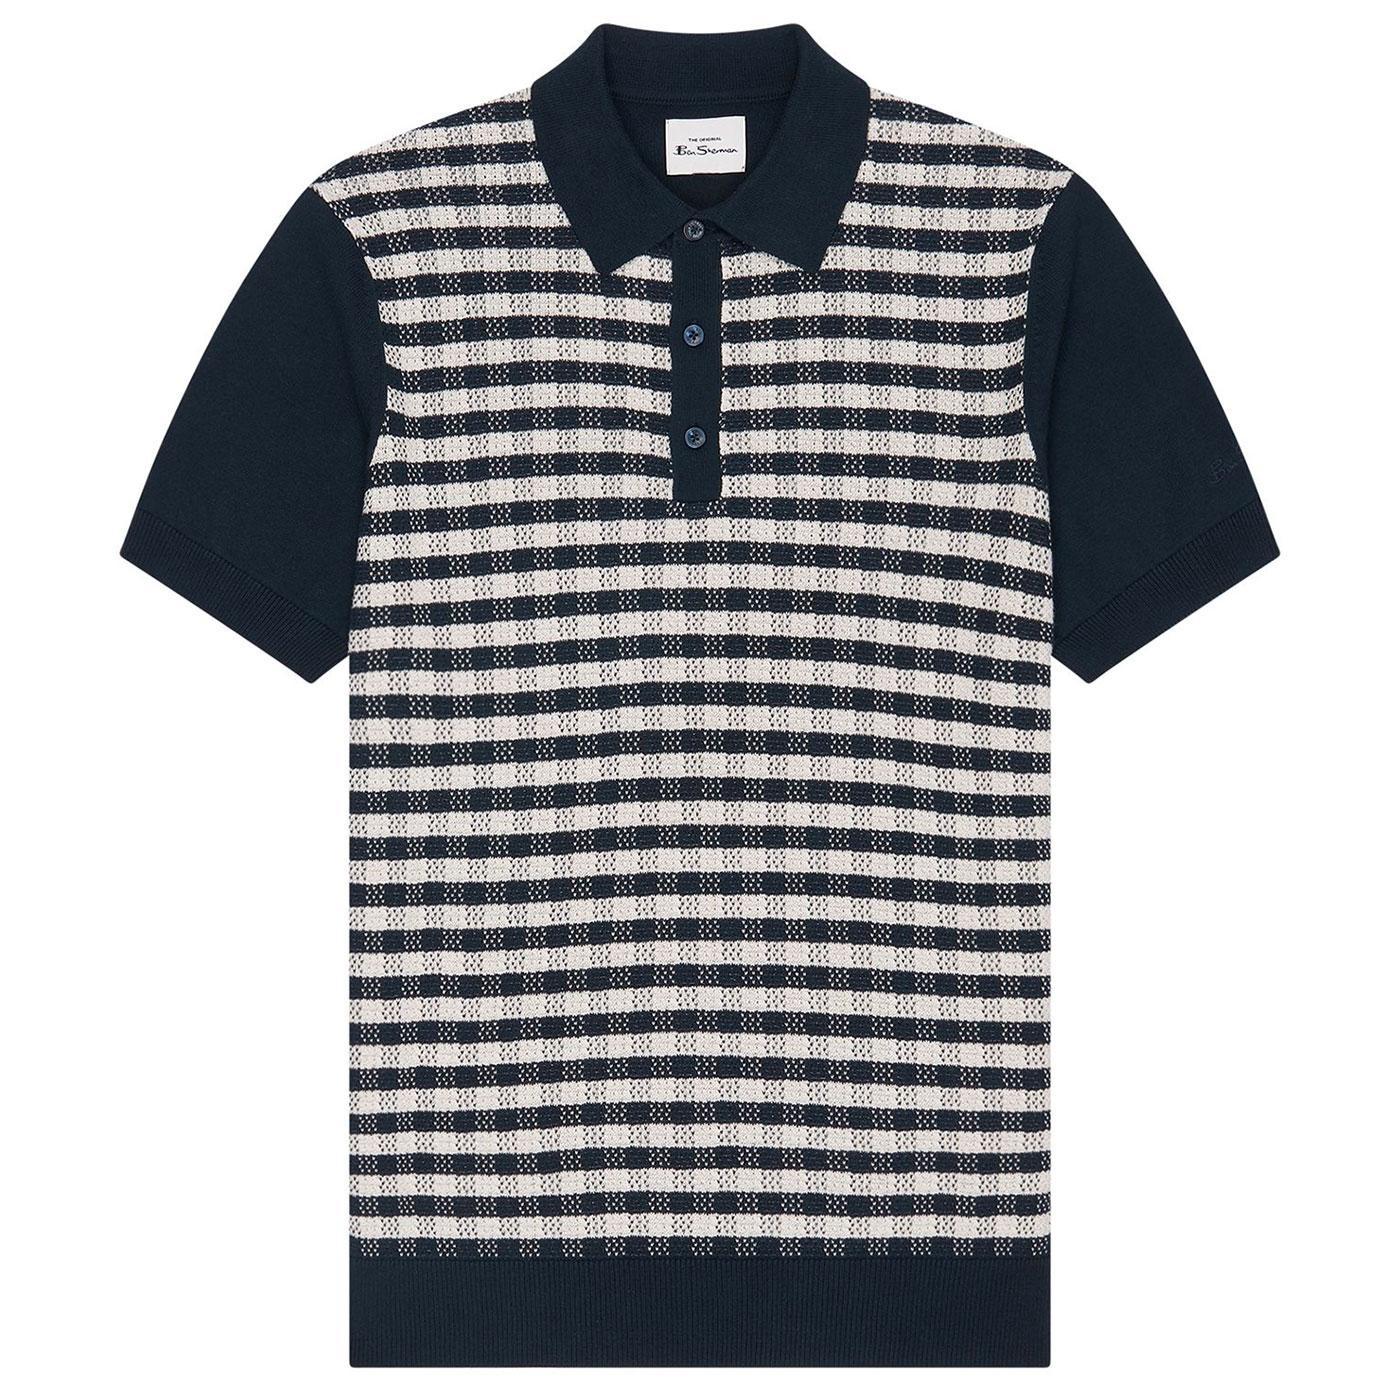 BEN SHERMAN Men's Mod Retro Gingham Jacquard Polo